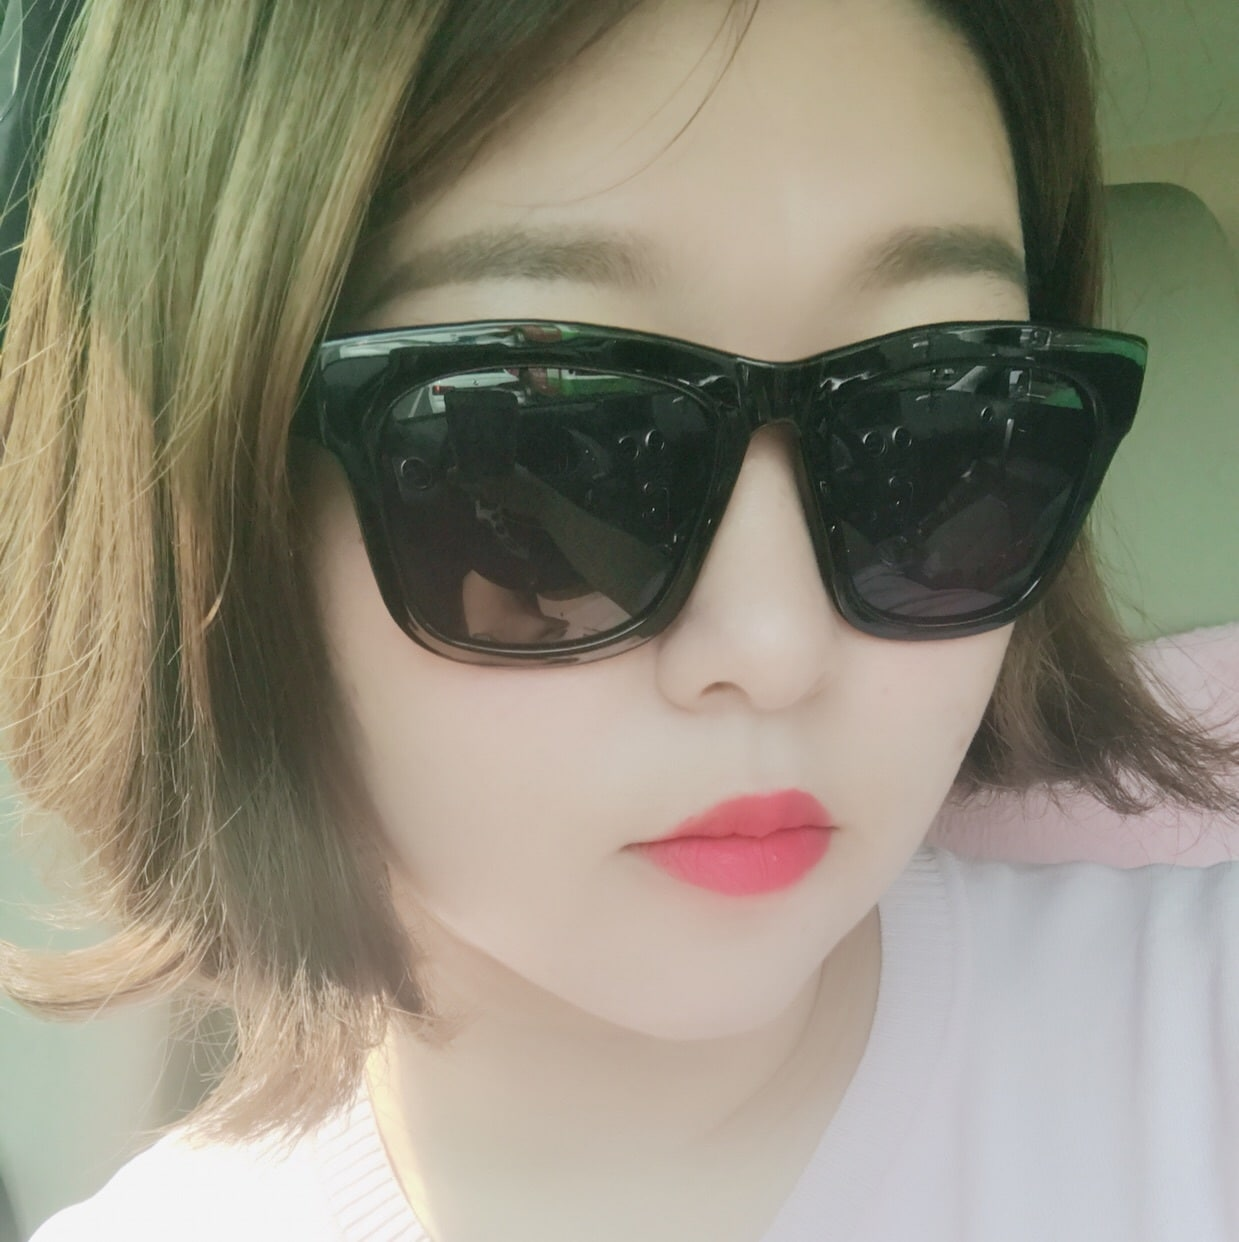 Jesscia-笔芯